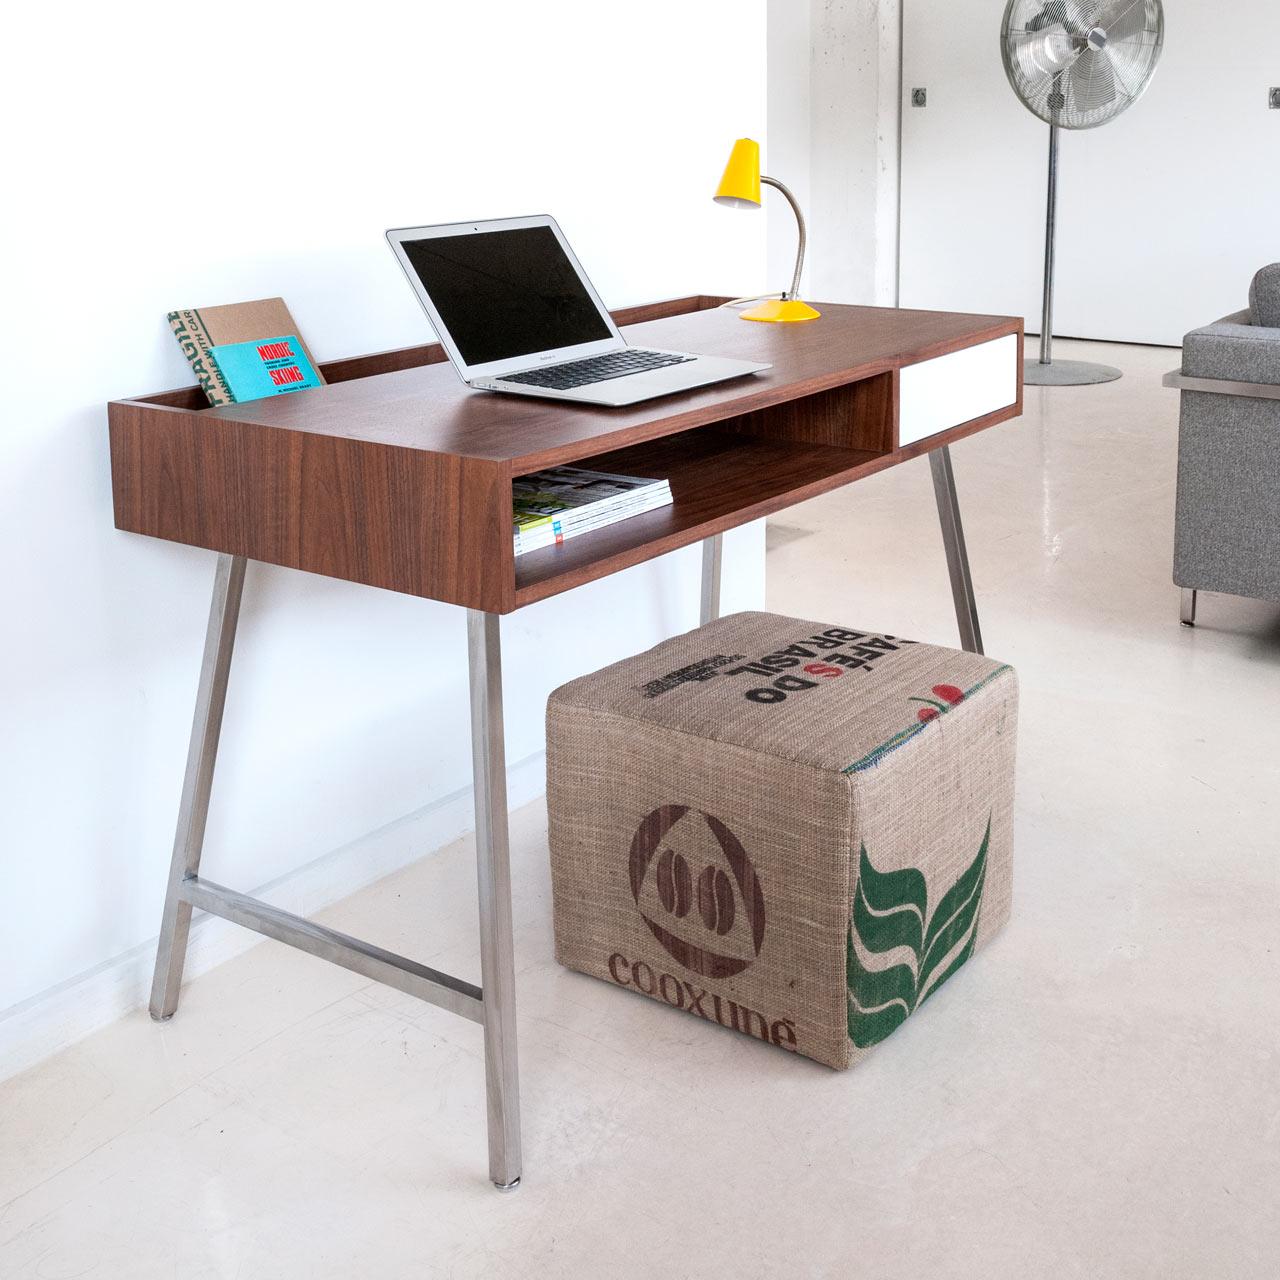 Best Kitchen Gallery: Modern Desks From Gus Modern Design Milk of Modern Desks For Home  on rachelxblog.com